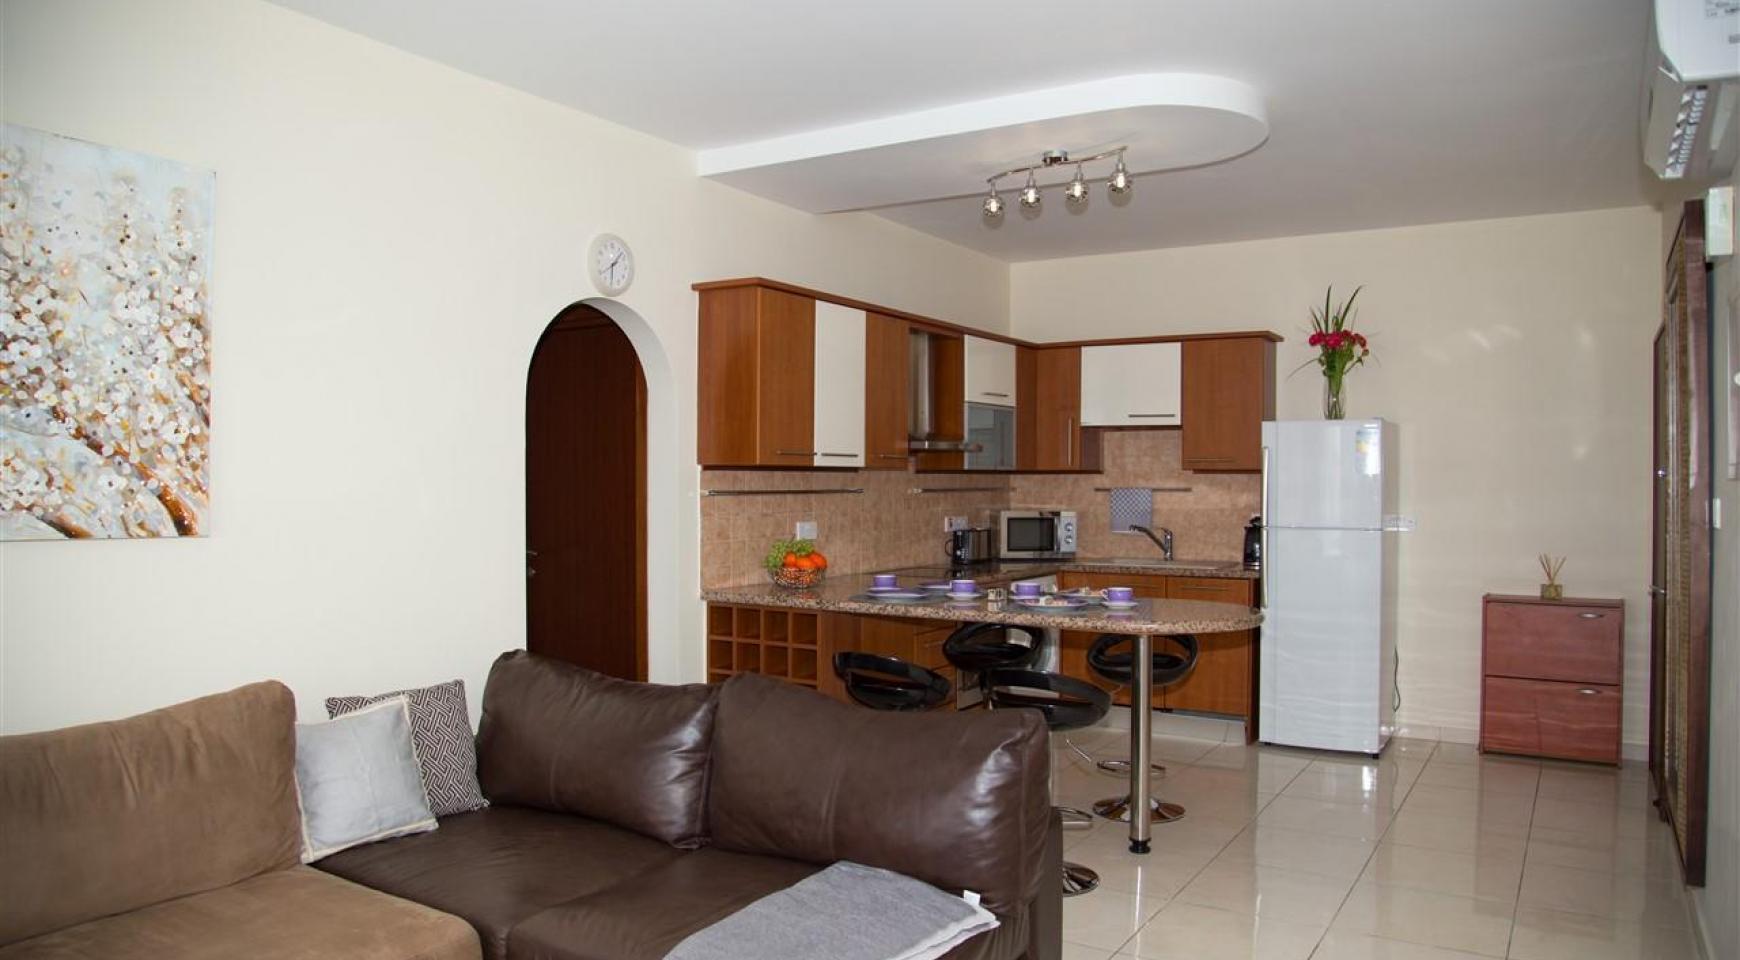 Luxury 2 Bedroom Apartment Mesogios Iris 304 in the Tourist area near the Beach - 8